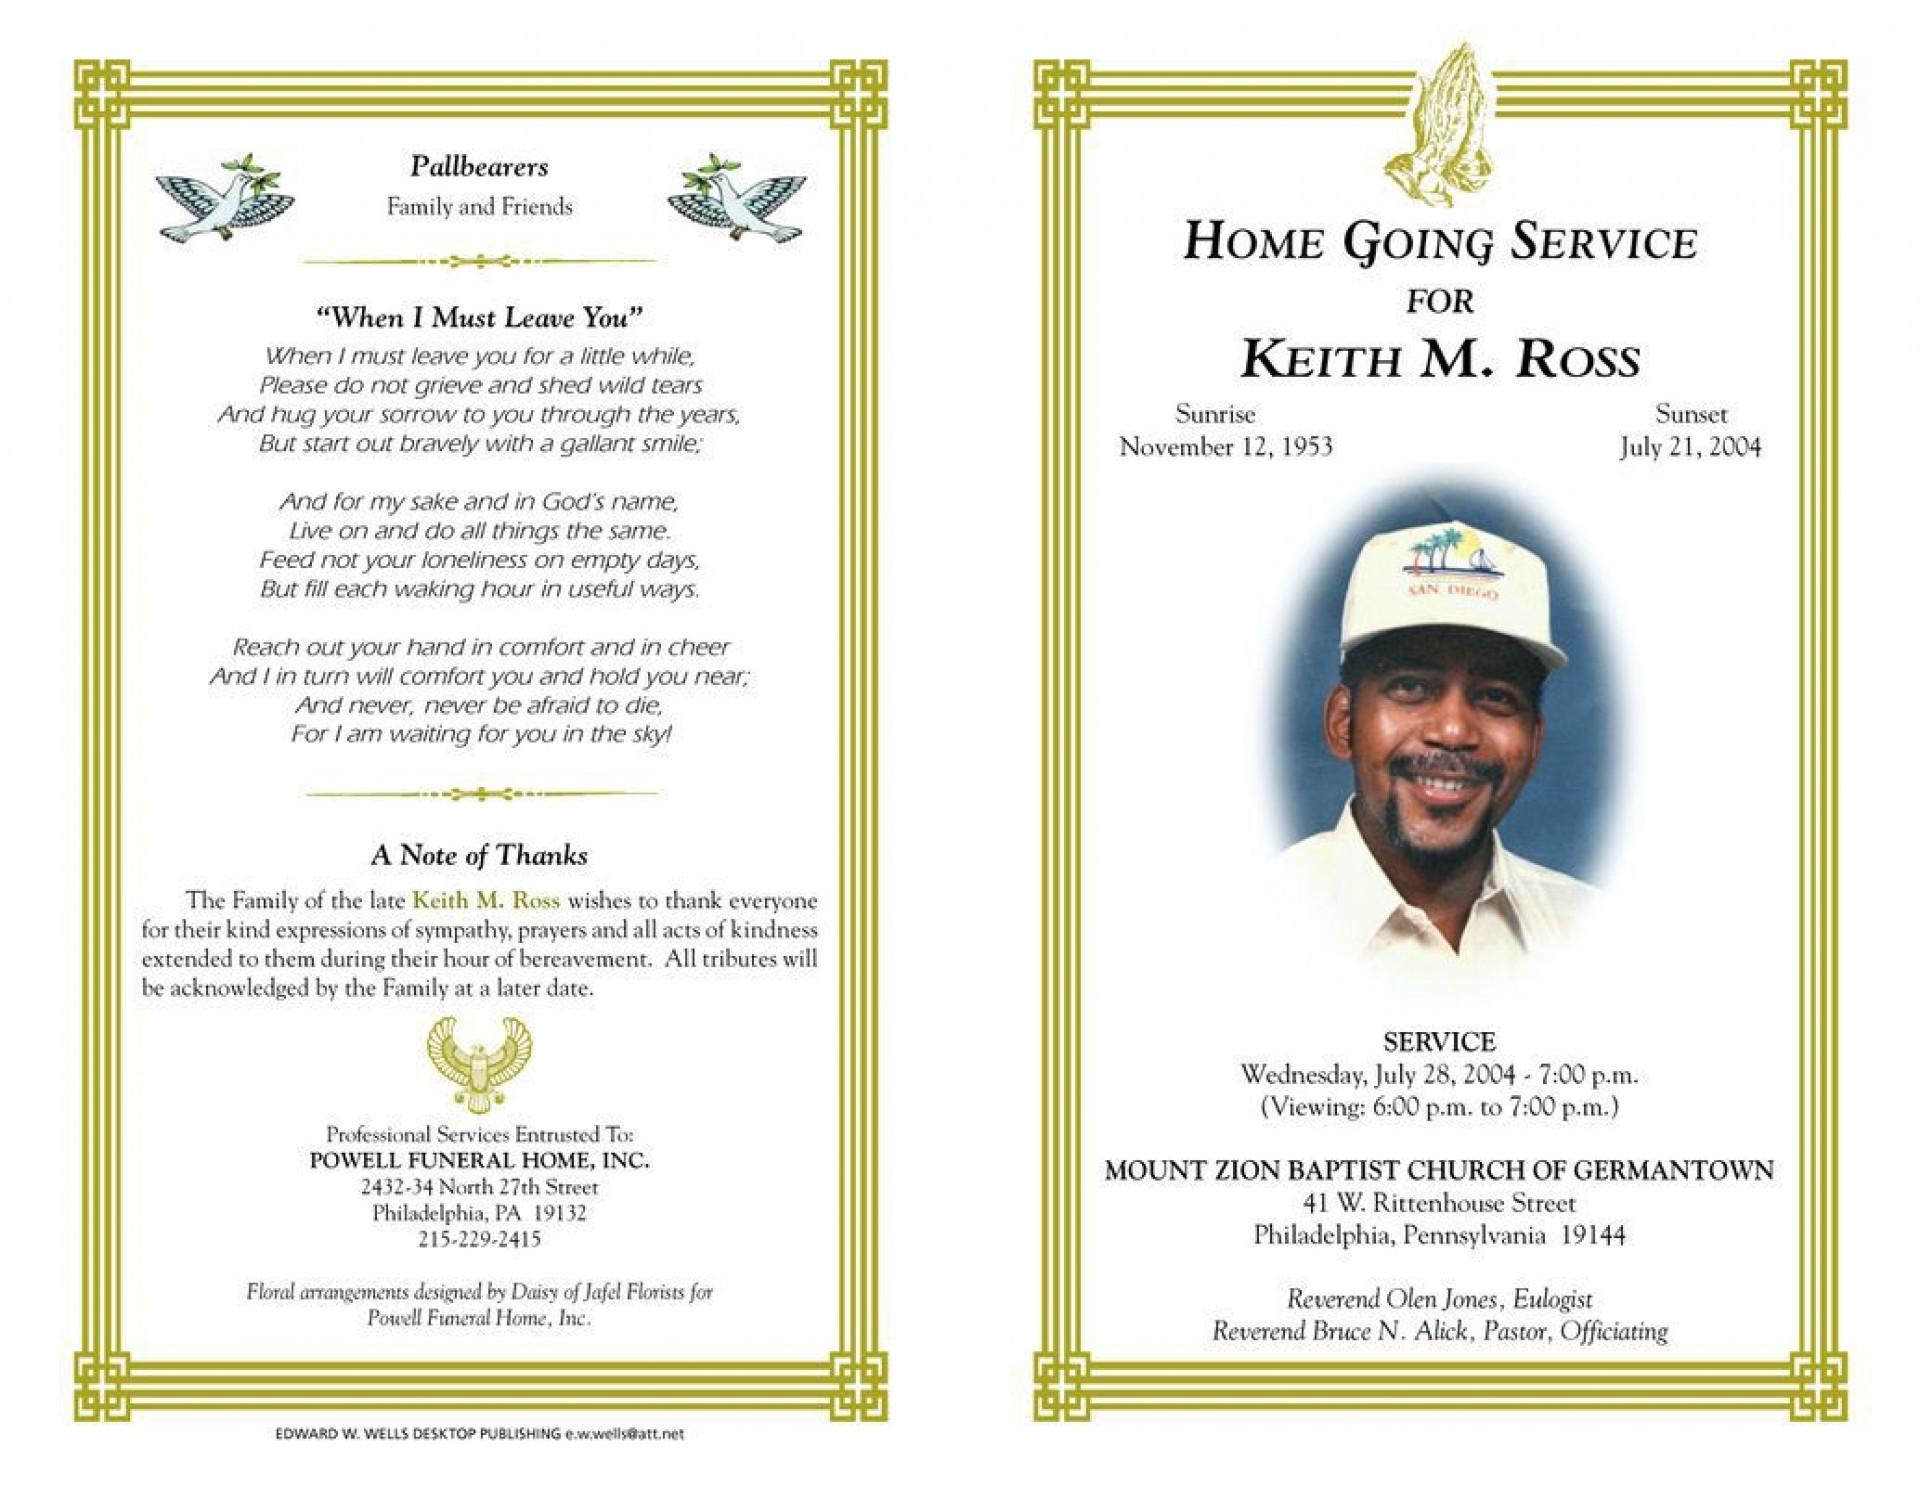 005 Breathtaking Funeral Program Template Free Design  Online Printable Download Publisher1920